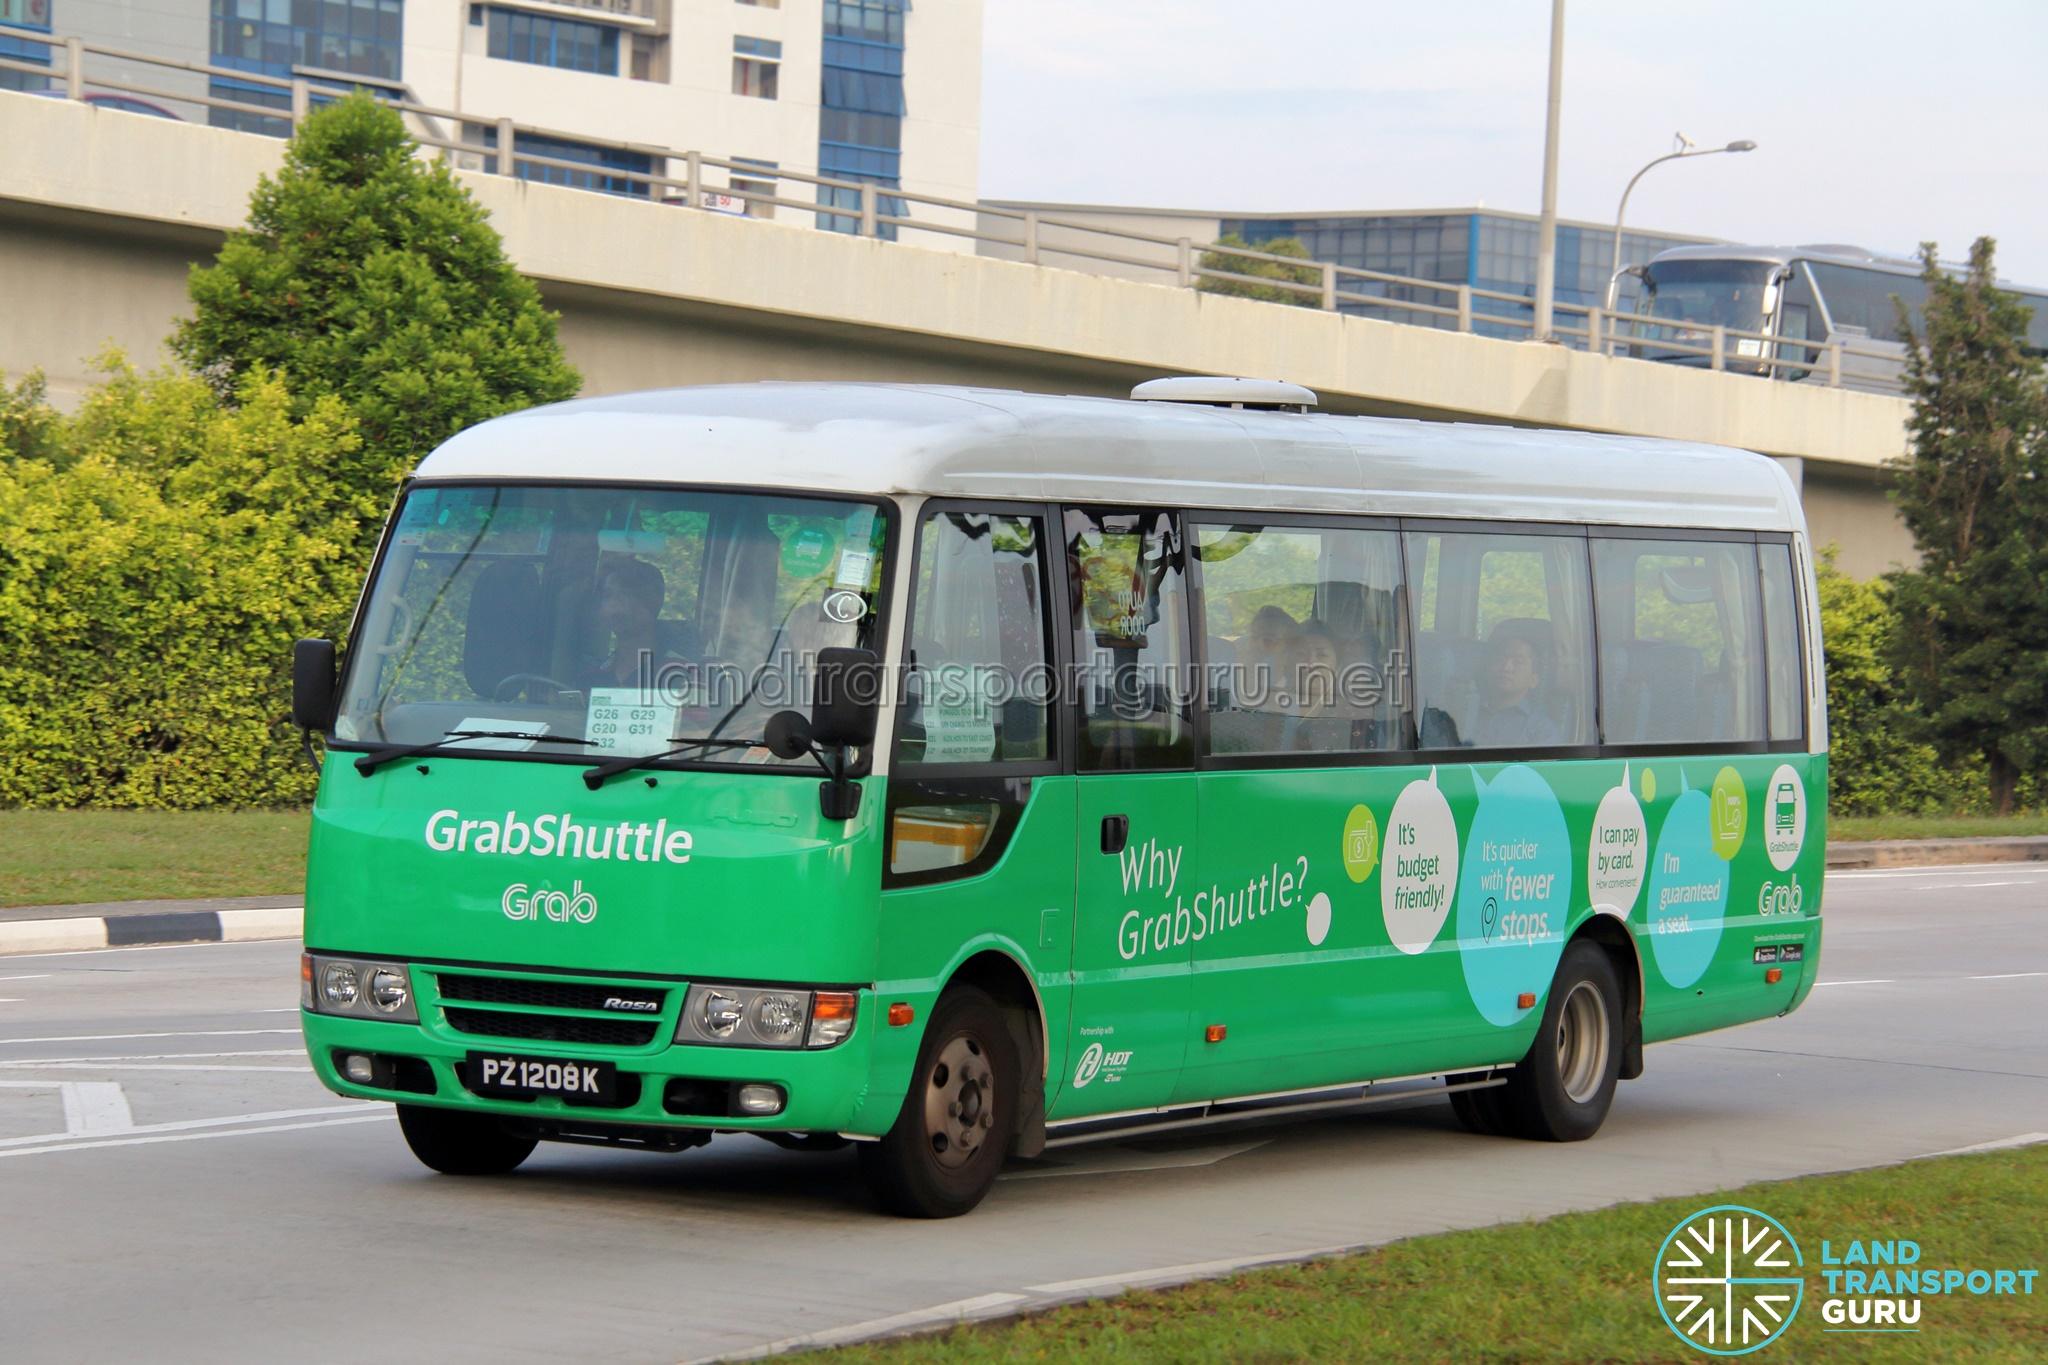 GrabShuttle Bus Routes | Land Transport Guru